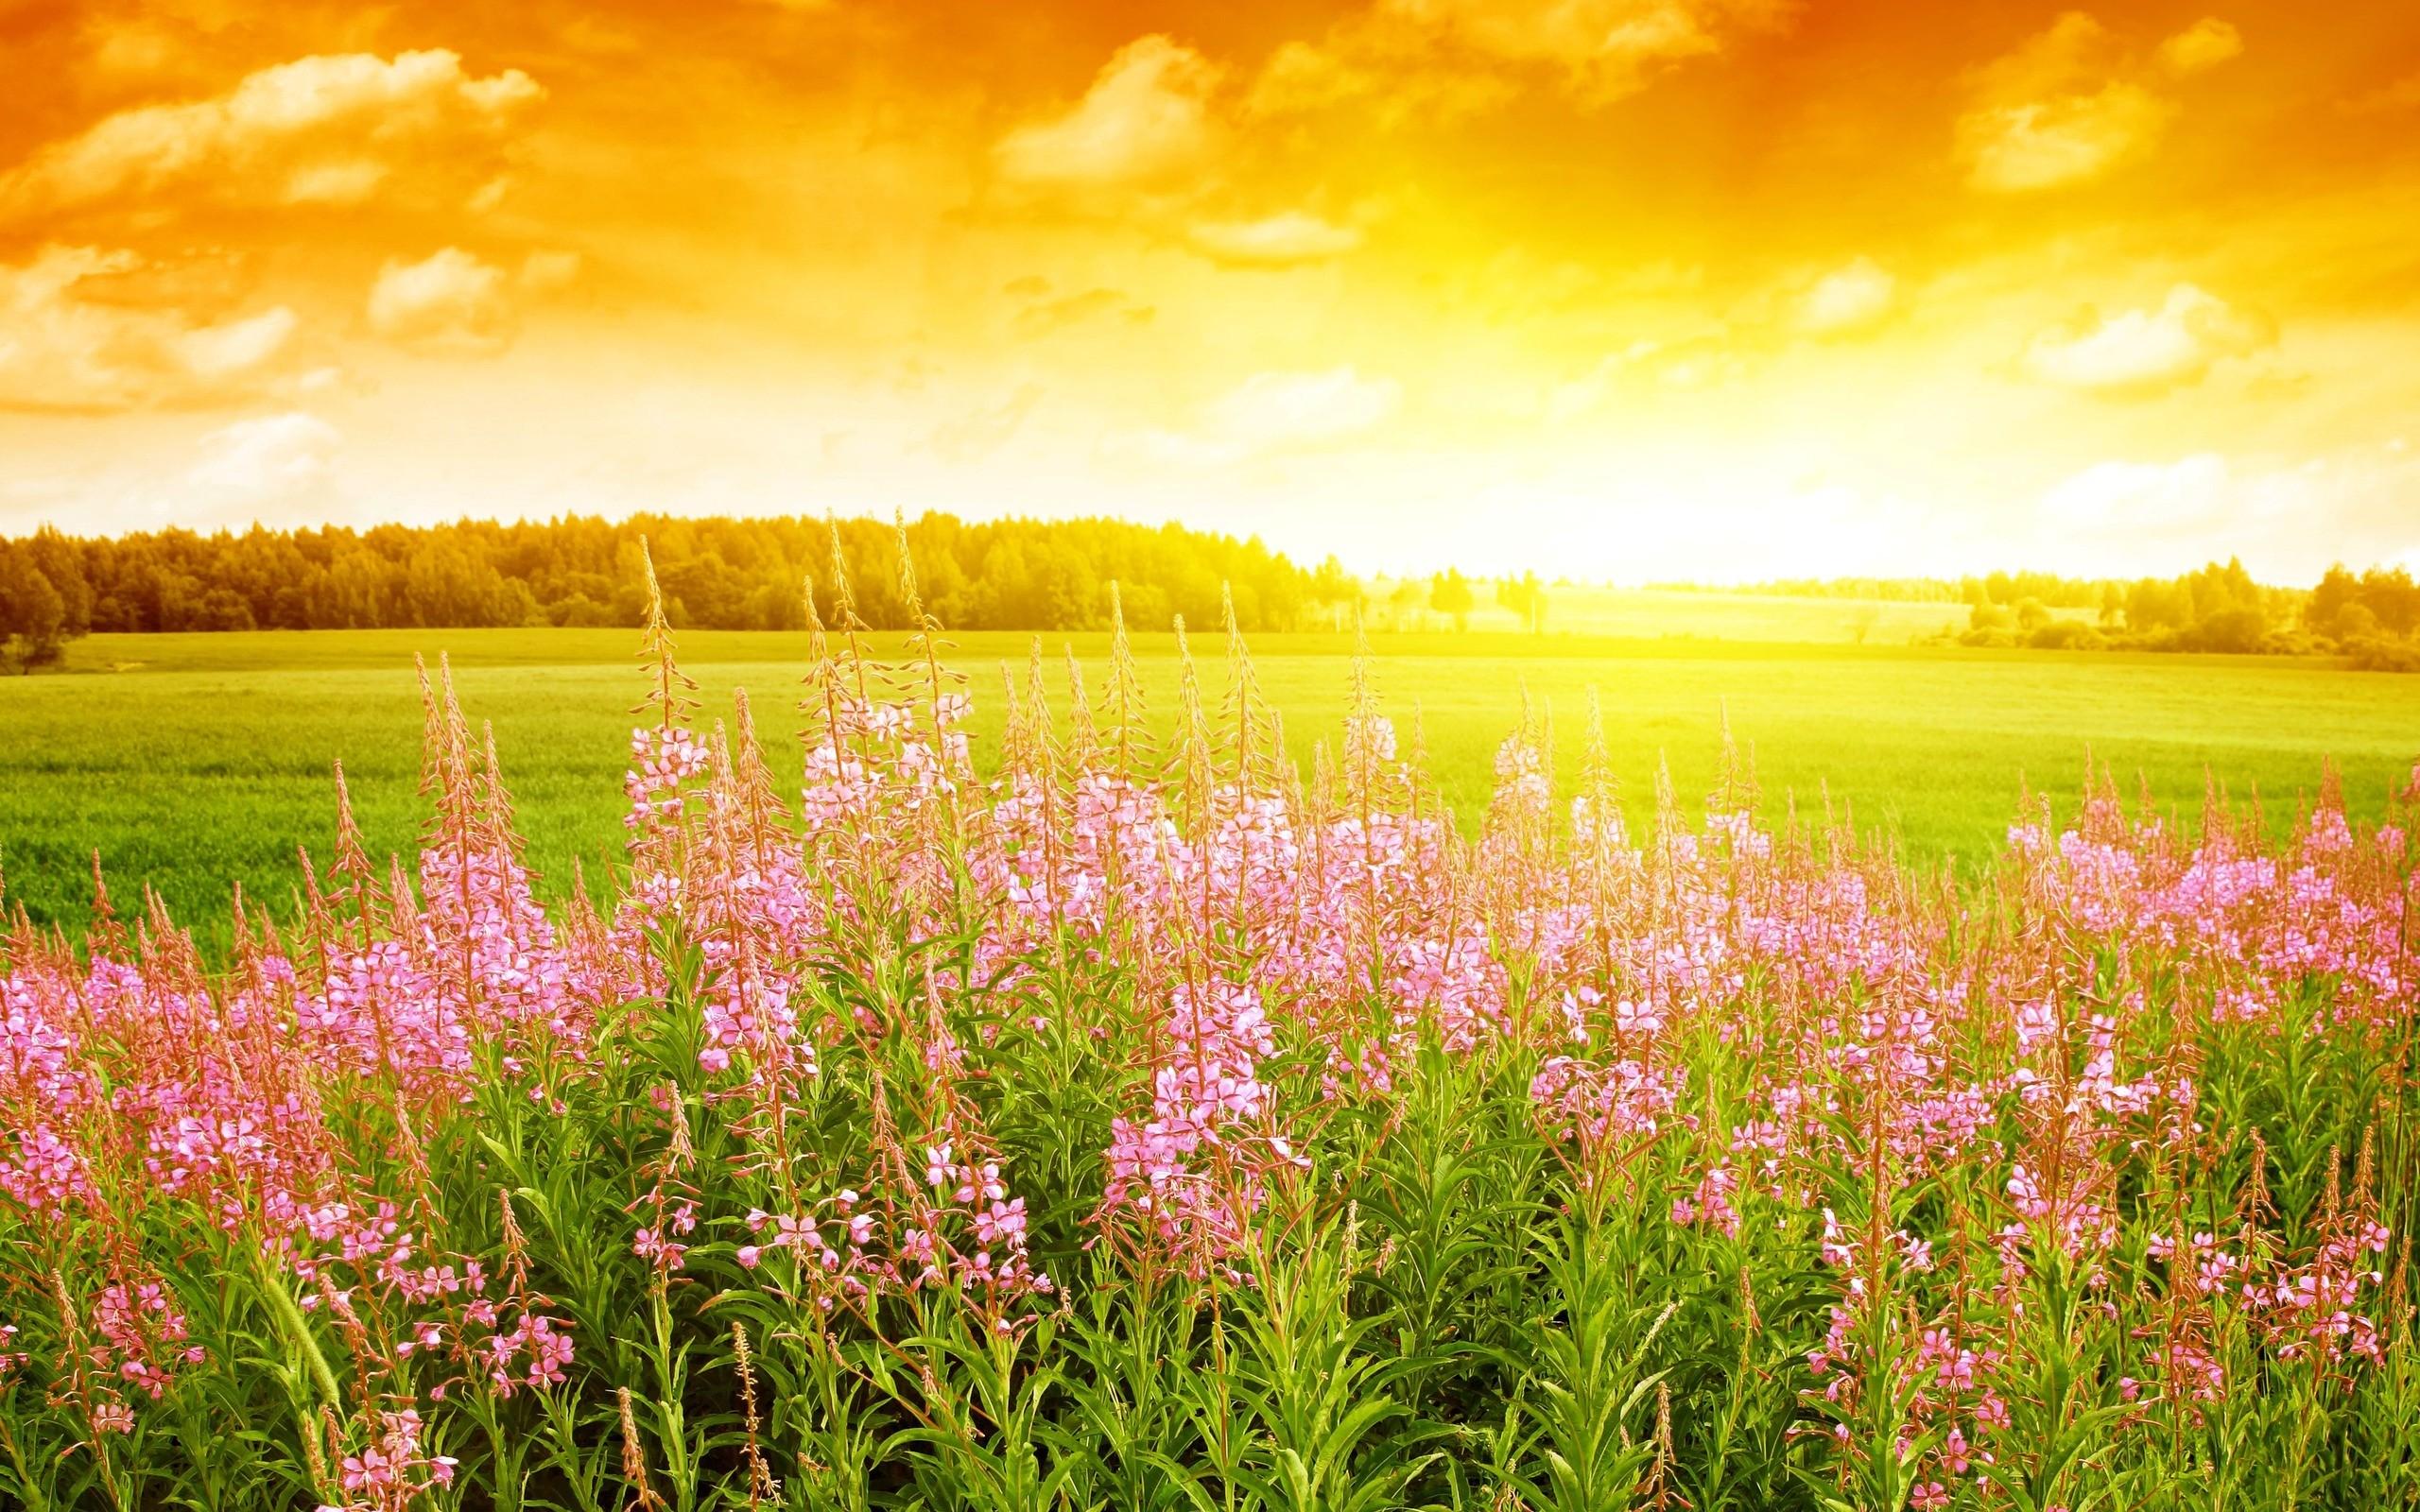 Spring Season Wallpaper Backgrounds HD wallpaper background 2560x1600